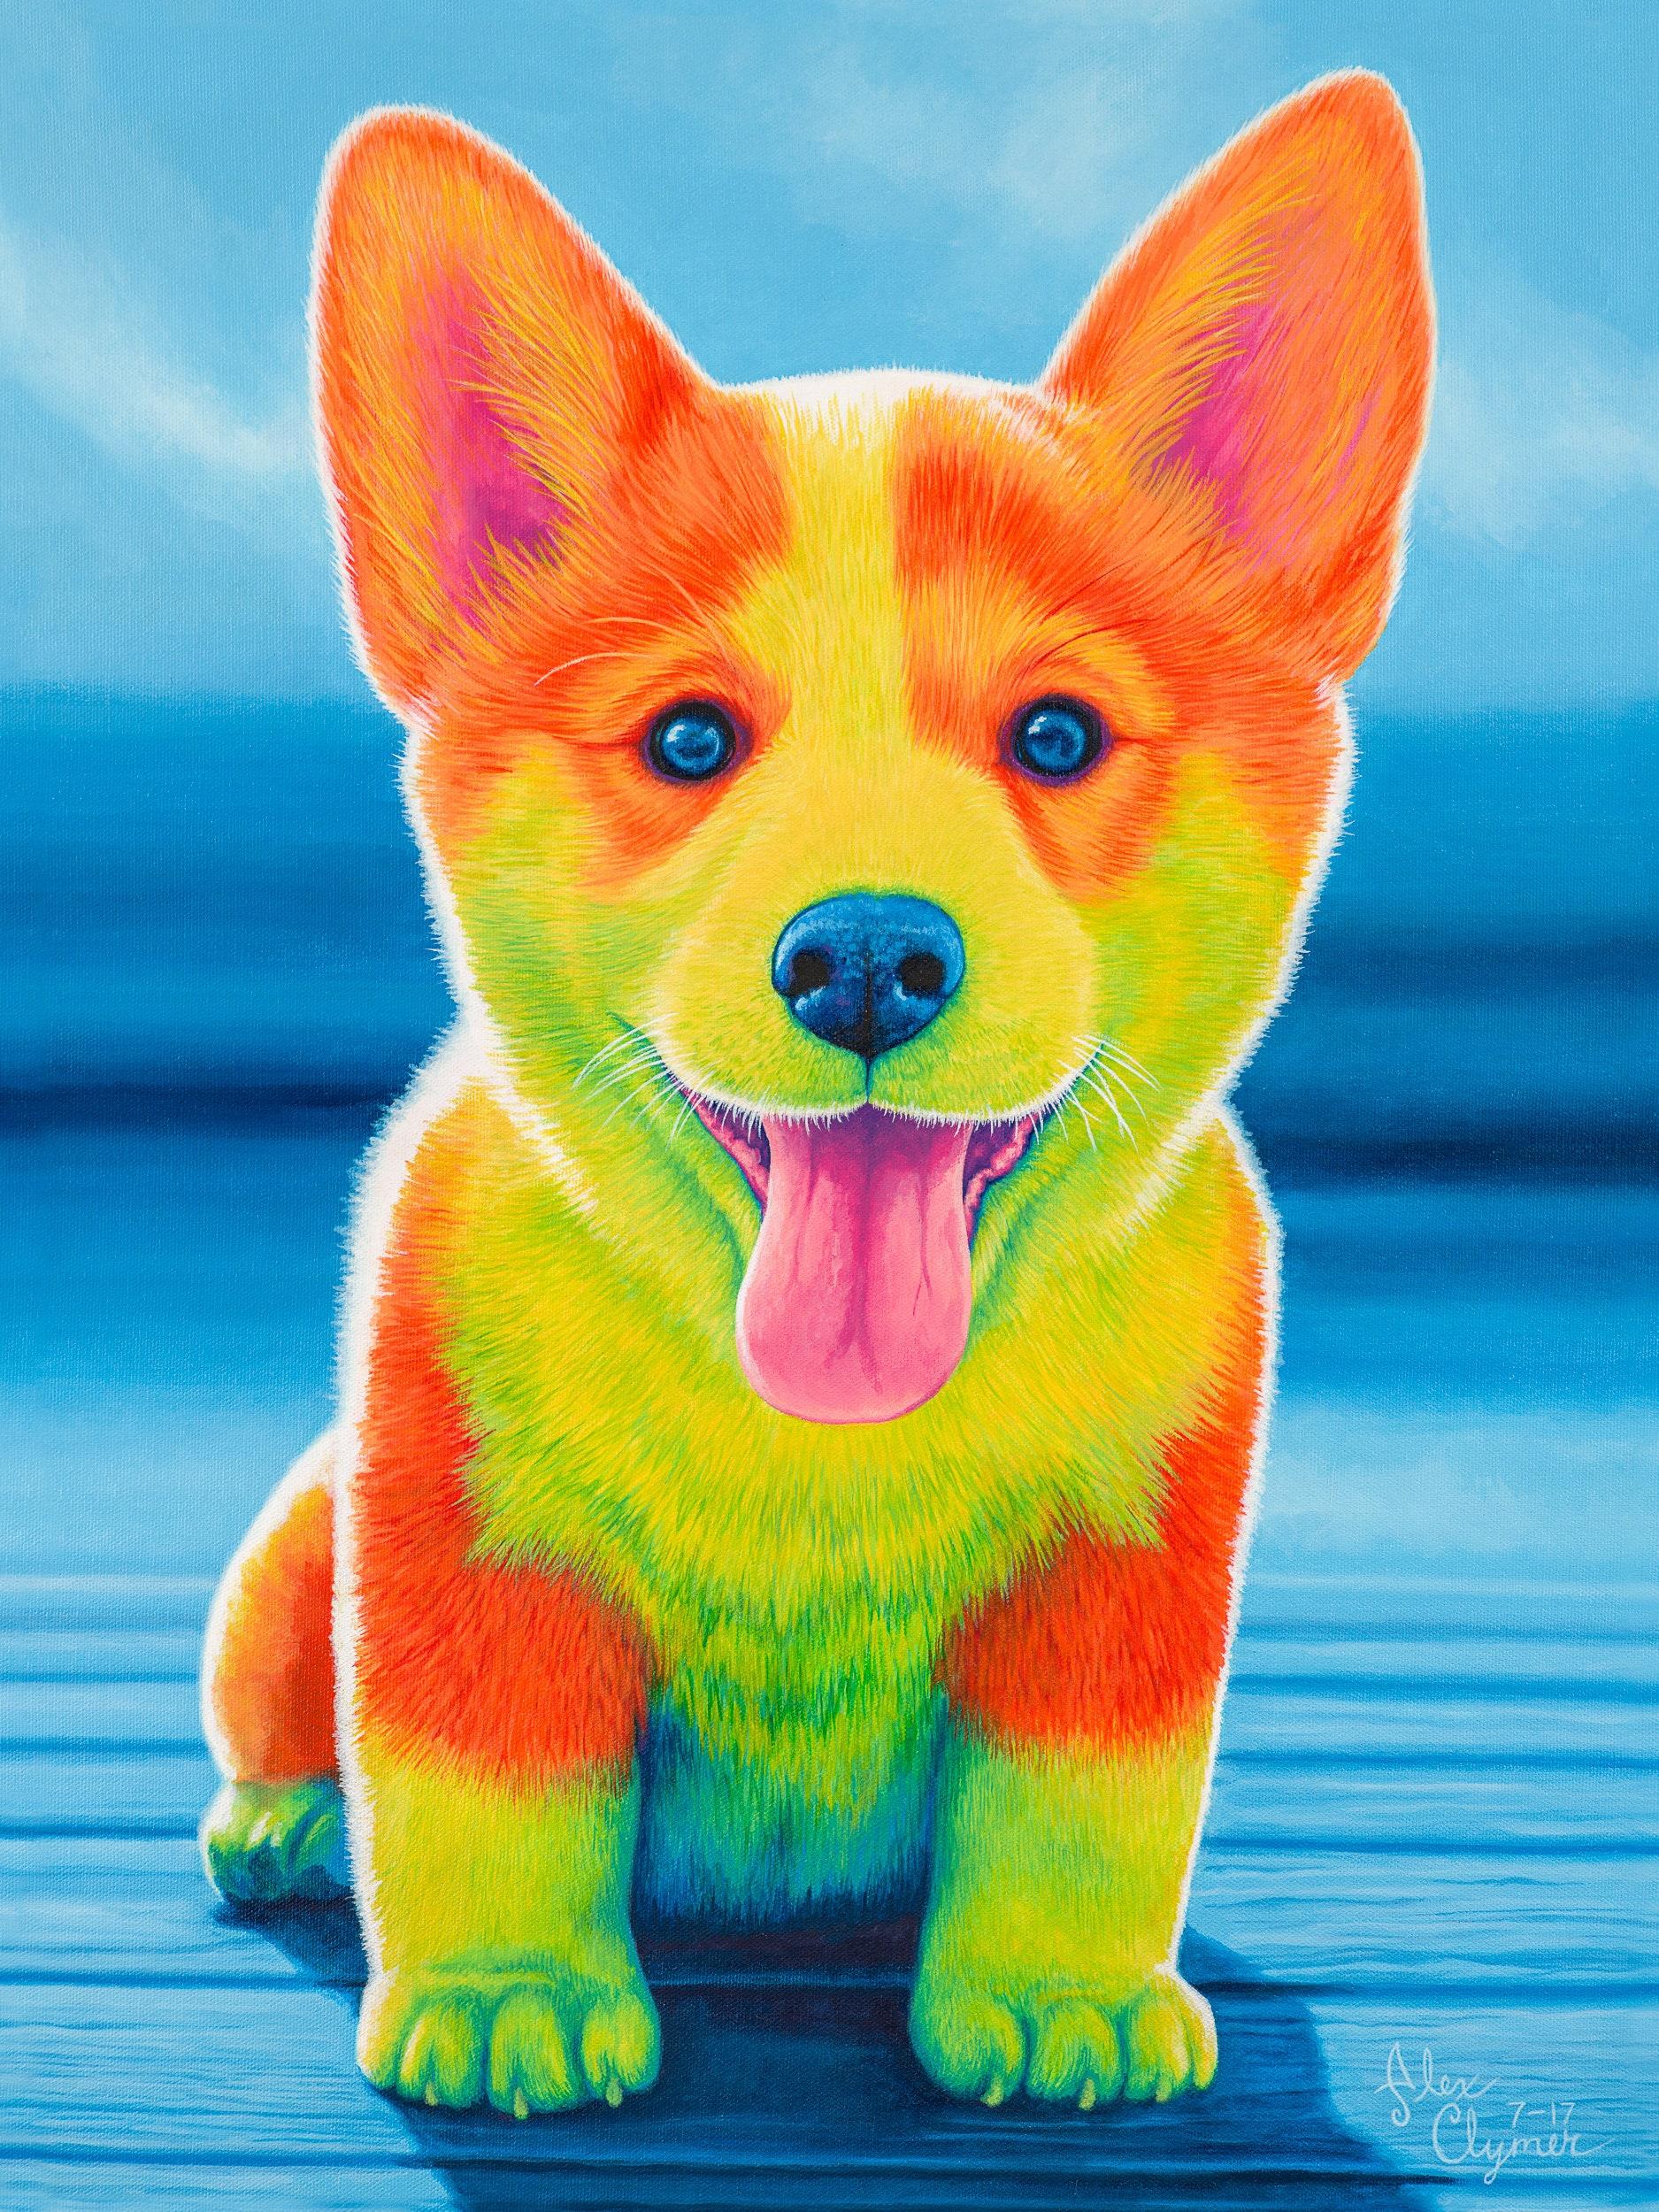 Colorful Corgi Painting Print Corgi Puppy Rainbow Dog